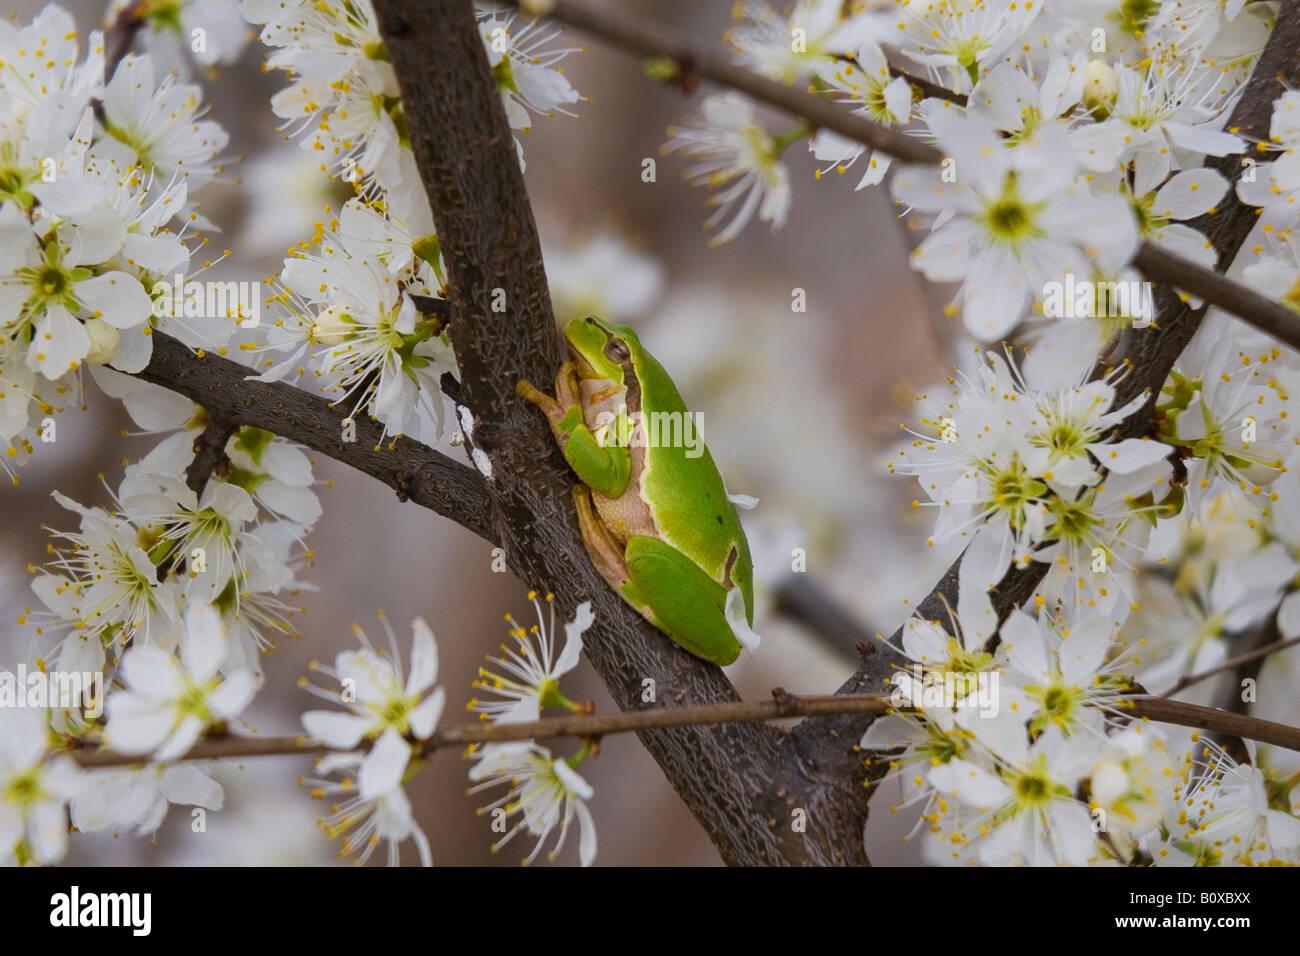 European treefrog, common treefrog, Central European treefrog (Hyla arborea), single animal on a blooming cherry Stock Photo